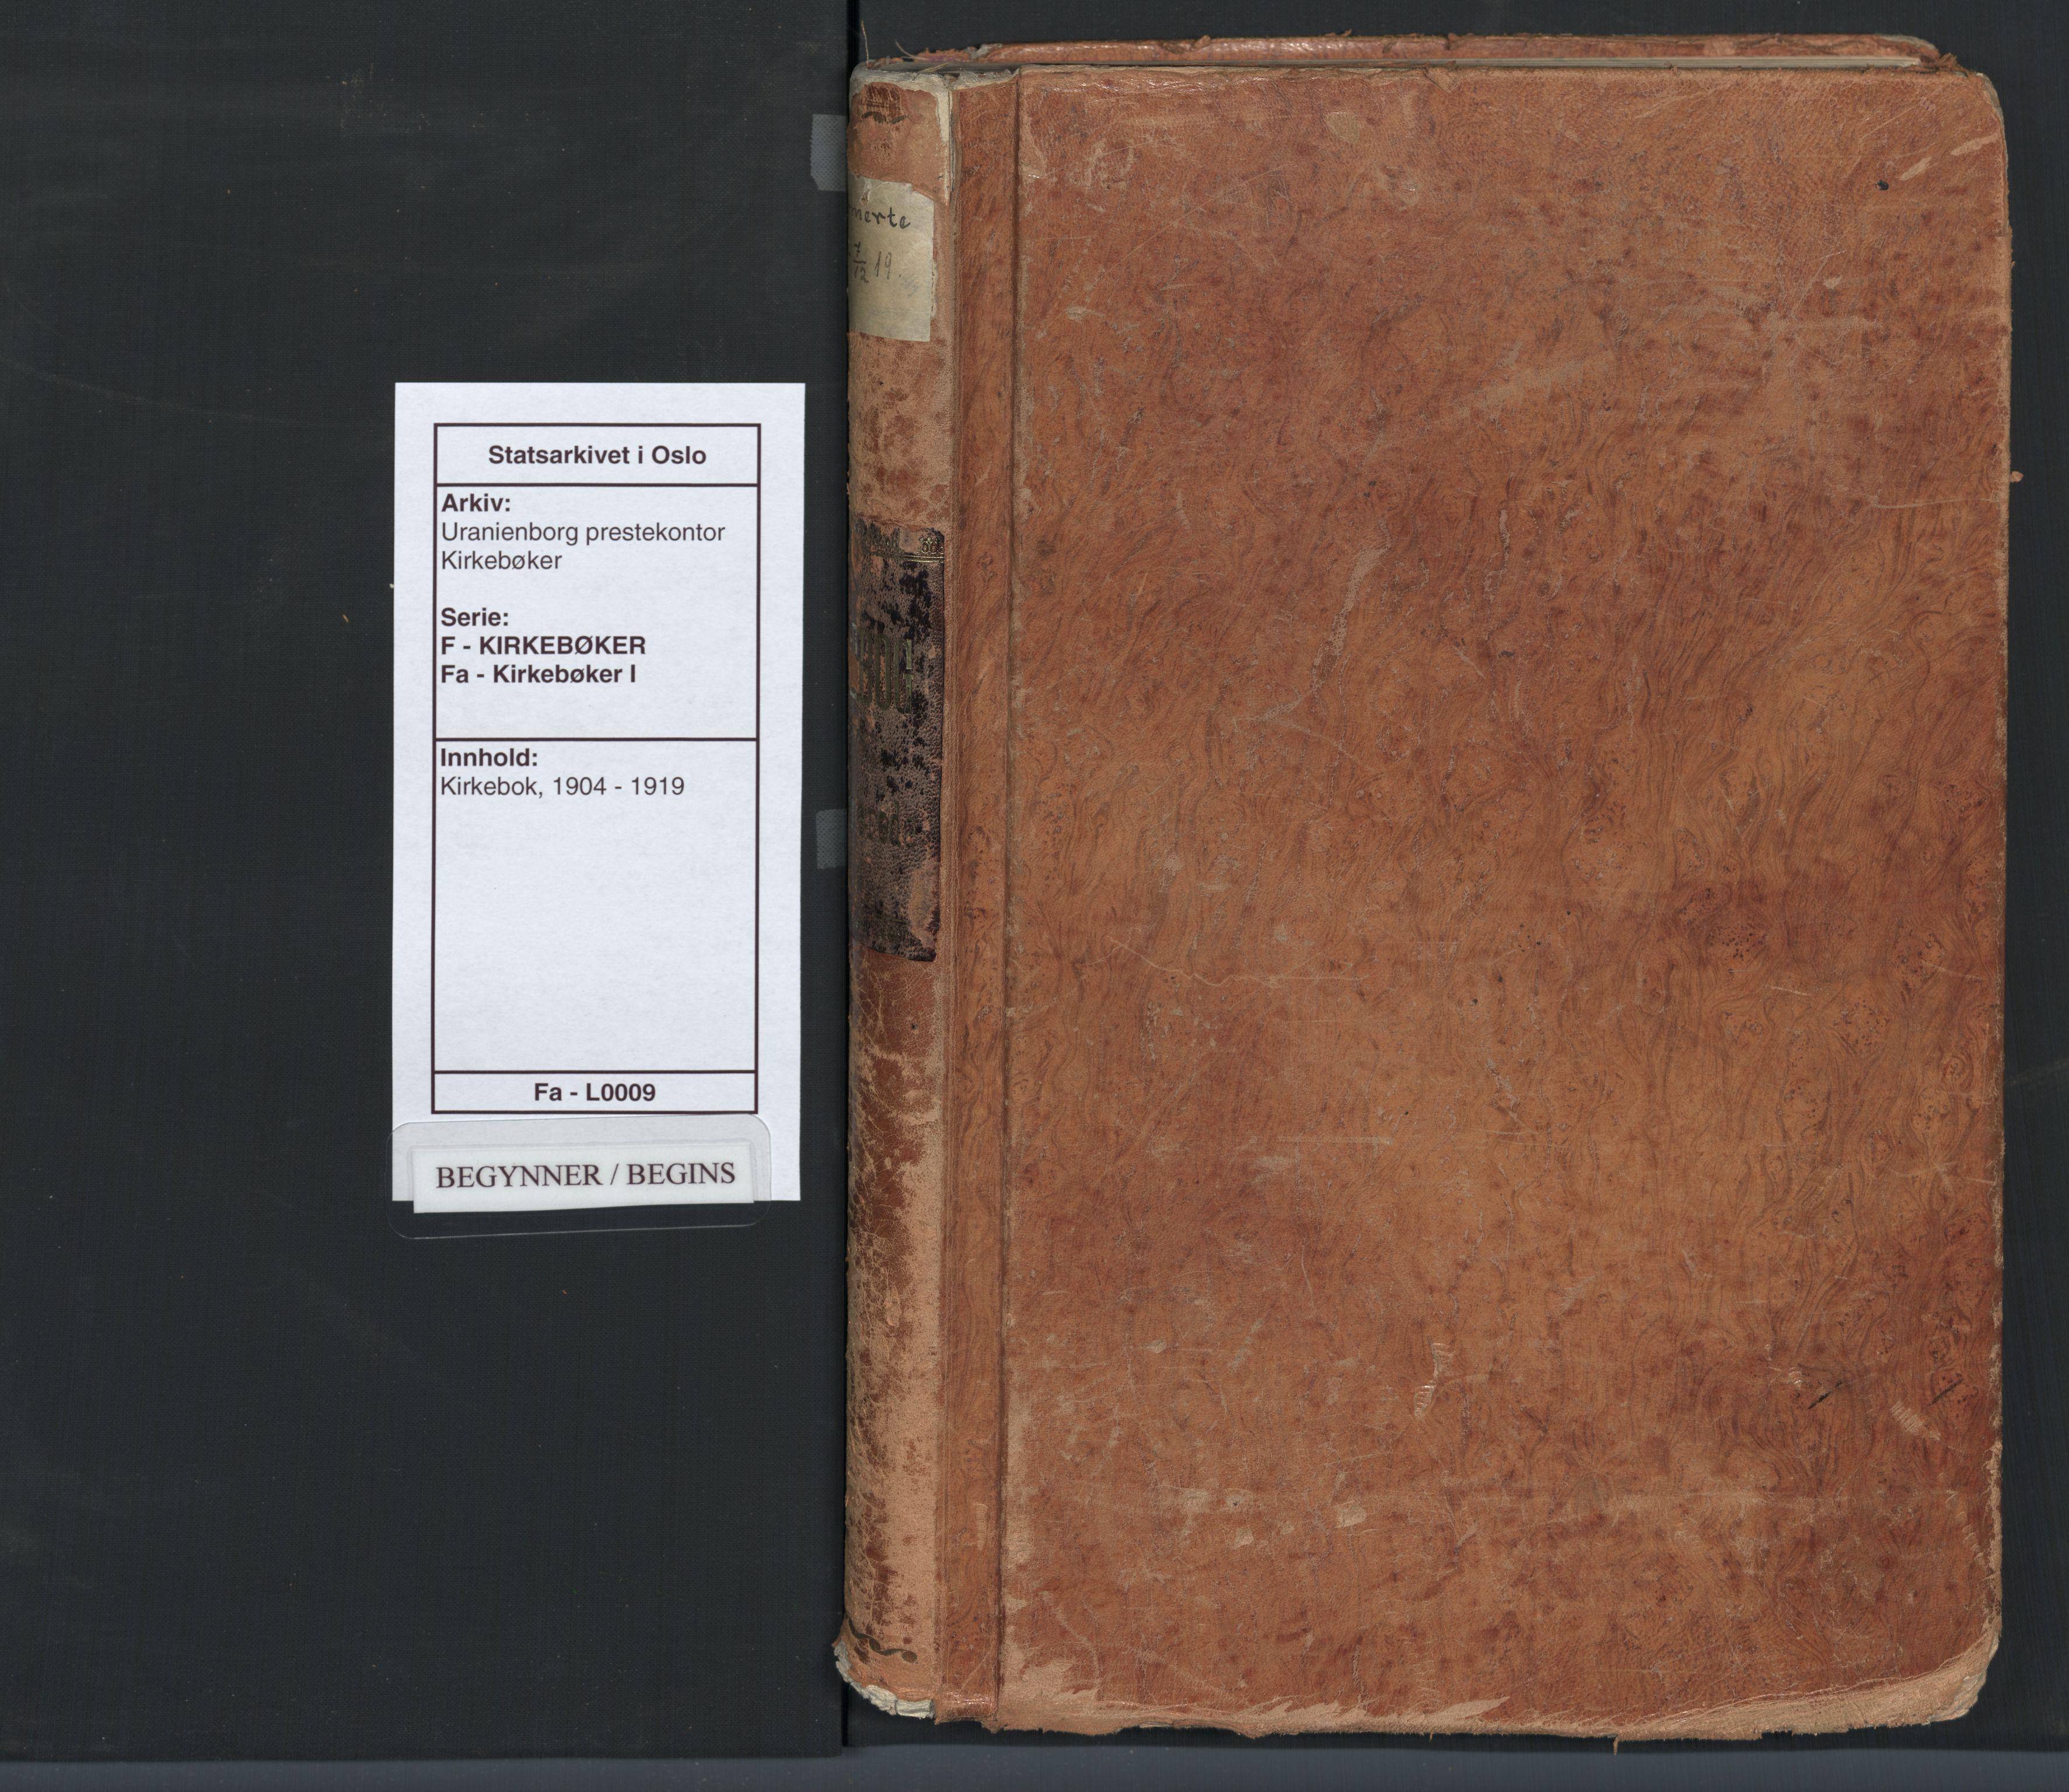 SAO, Uranienborg prestekontor Kirkebøker, F/Fa/L0009: Ministerialbok nr. 9, 1904-1919